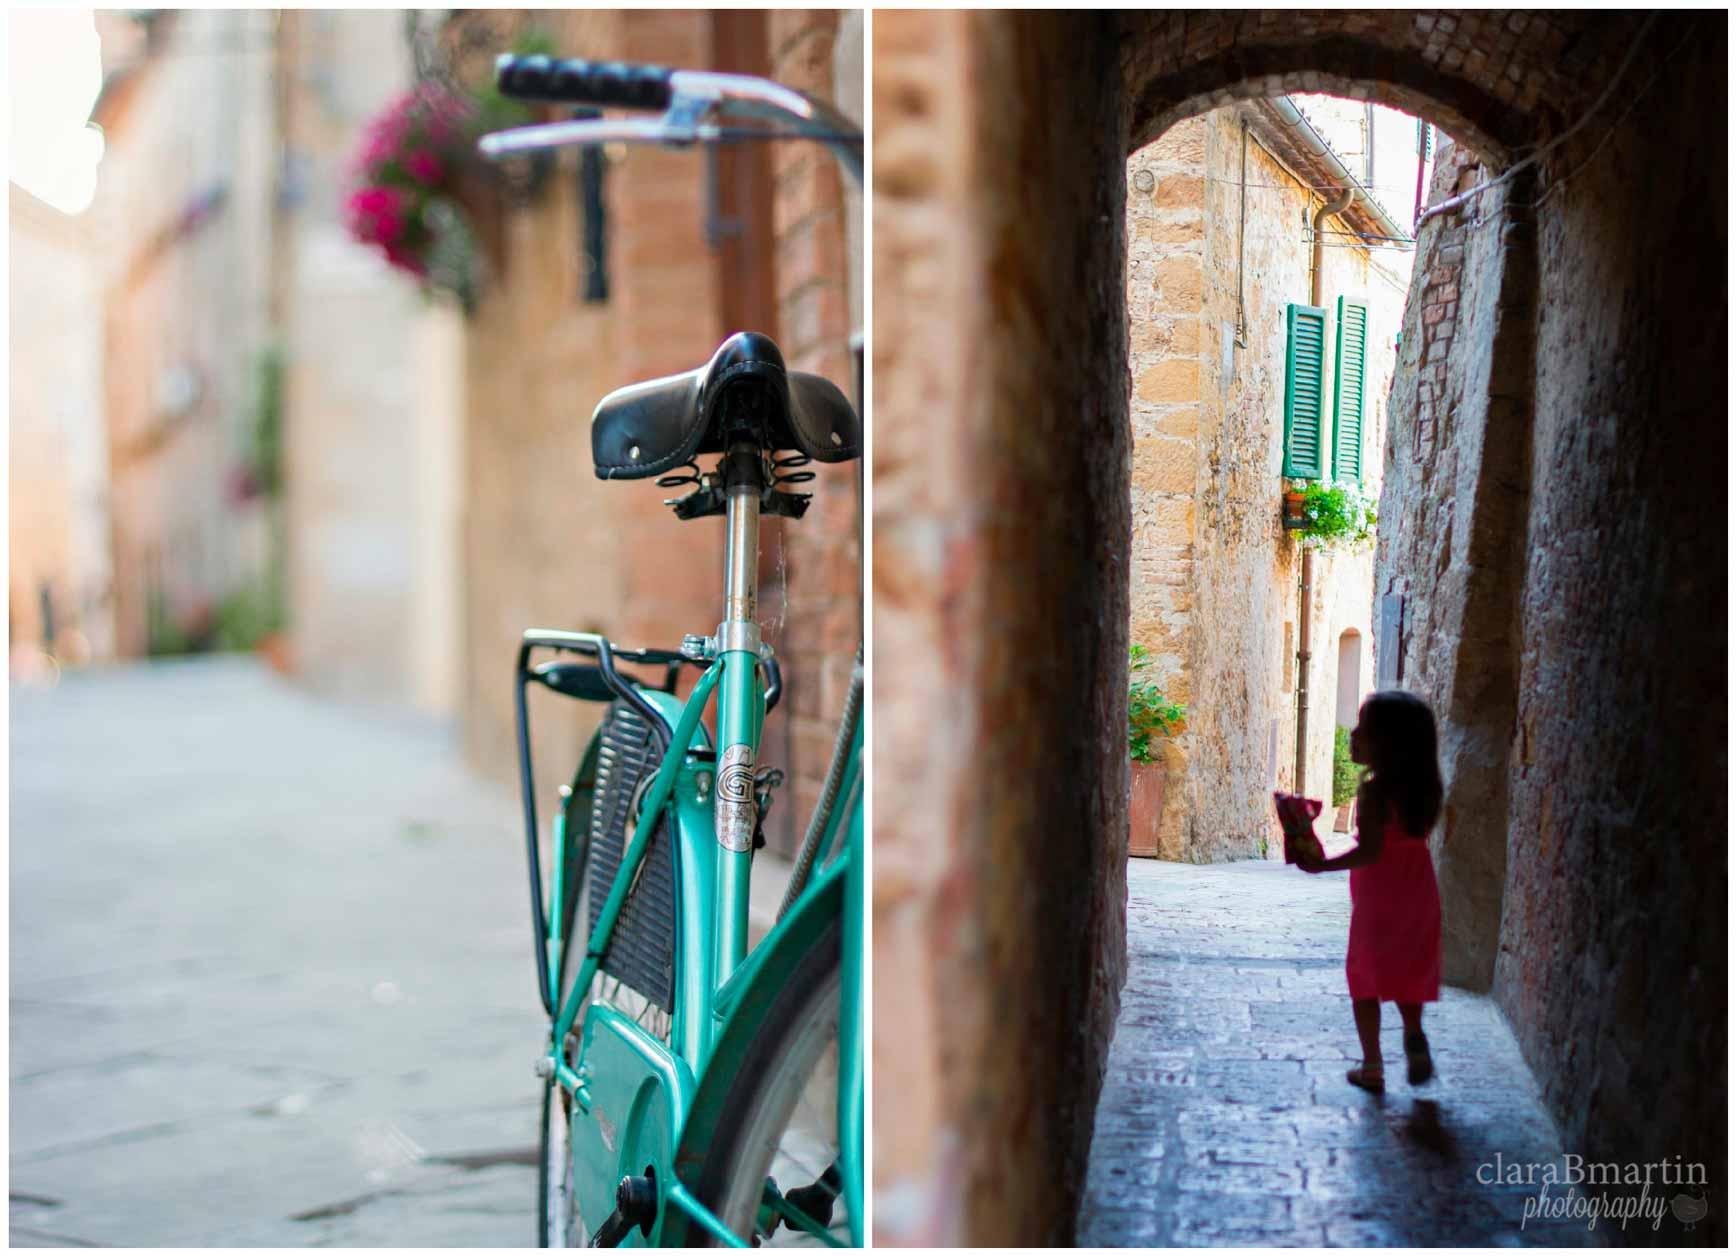 Tuscany_claraBmartin6Collage